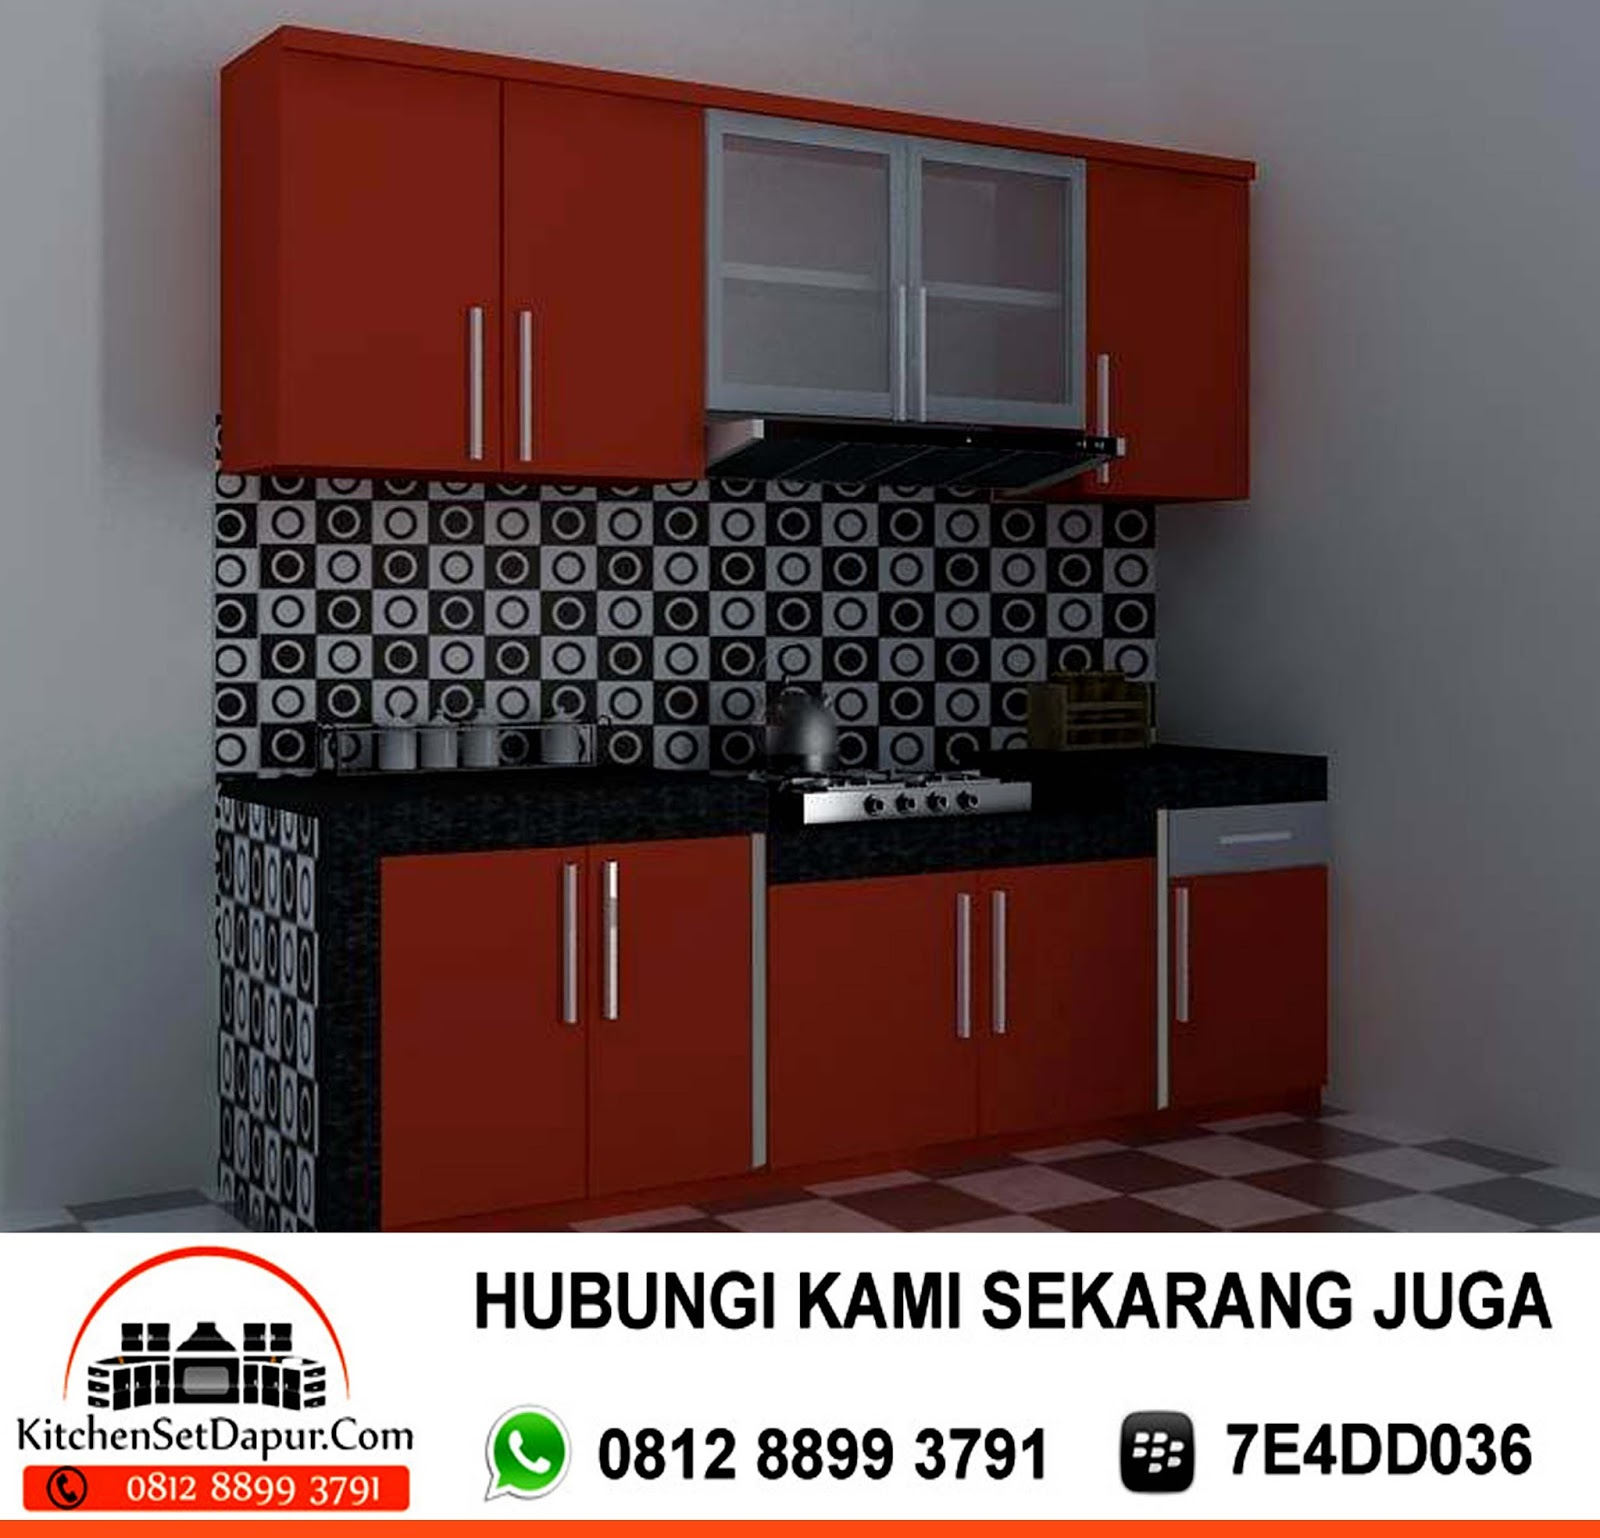 Jasa Pembuatan Kitchen Set Di Cibubur Hub 0812 8899 3791